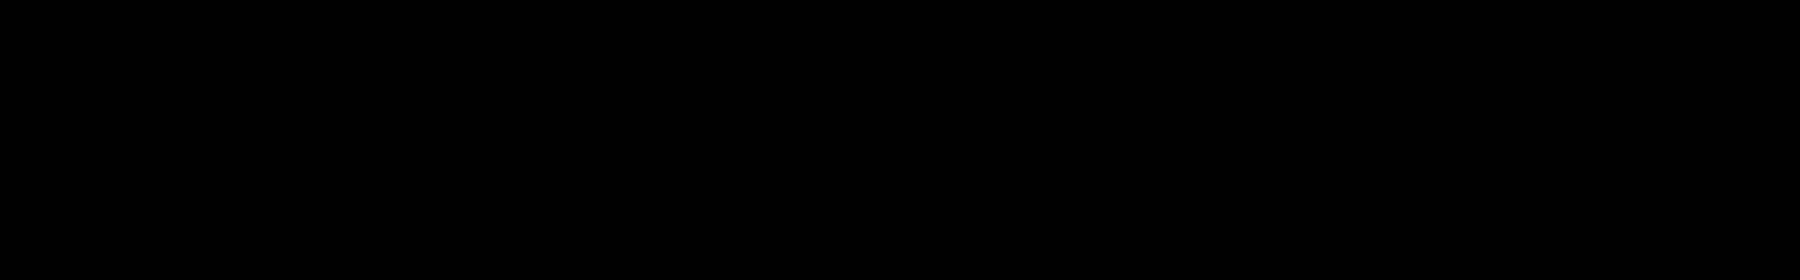 Unmüte SoulTown audio waveform